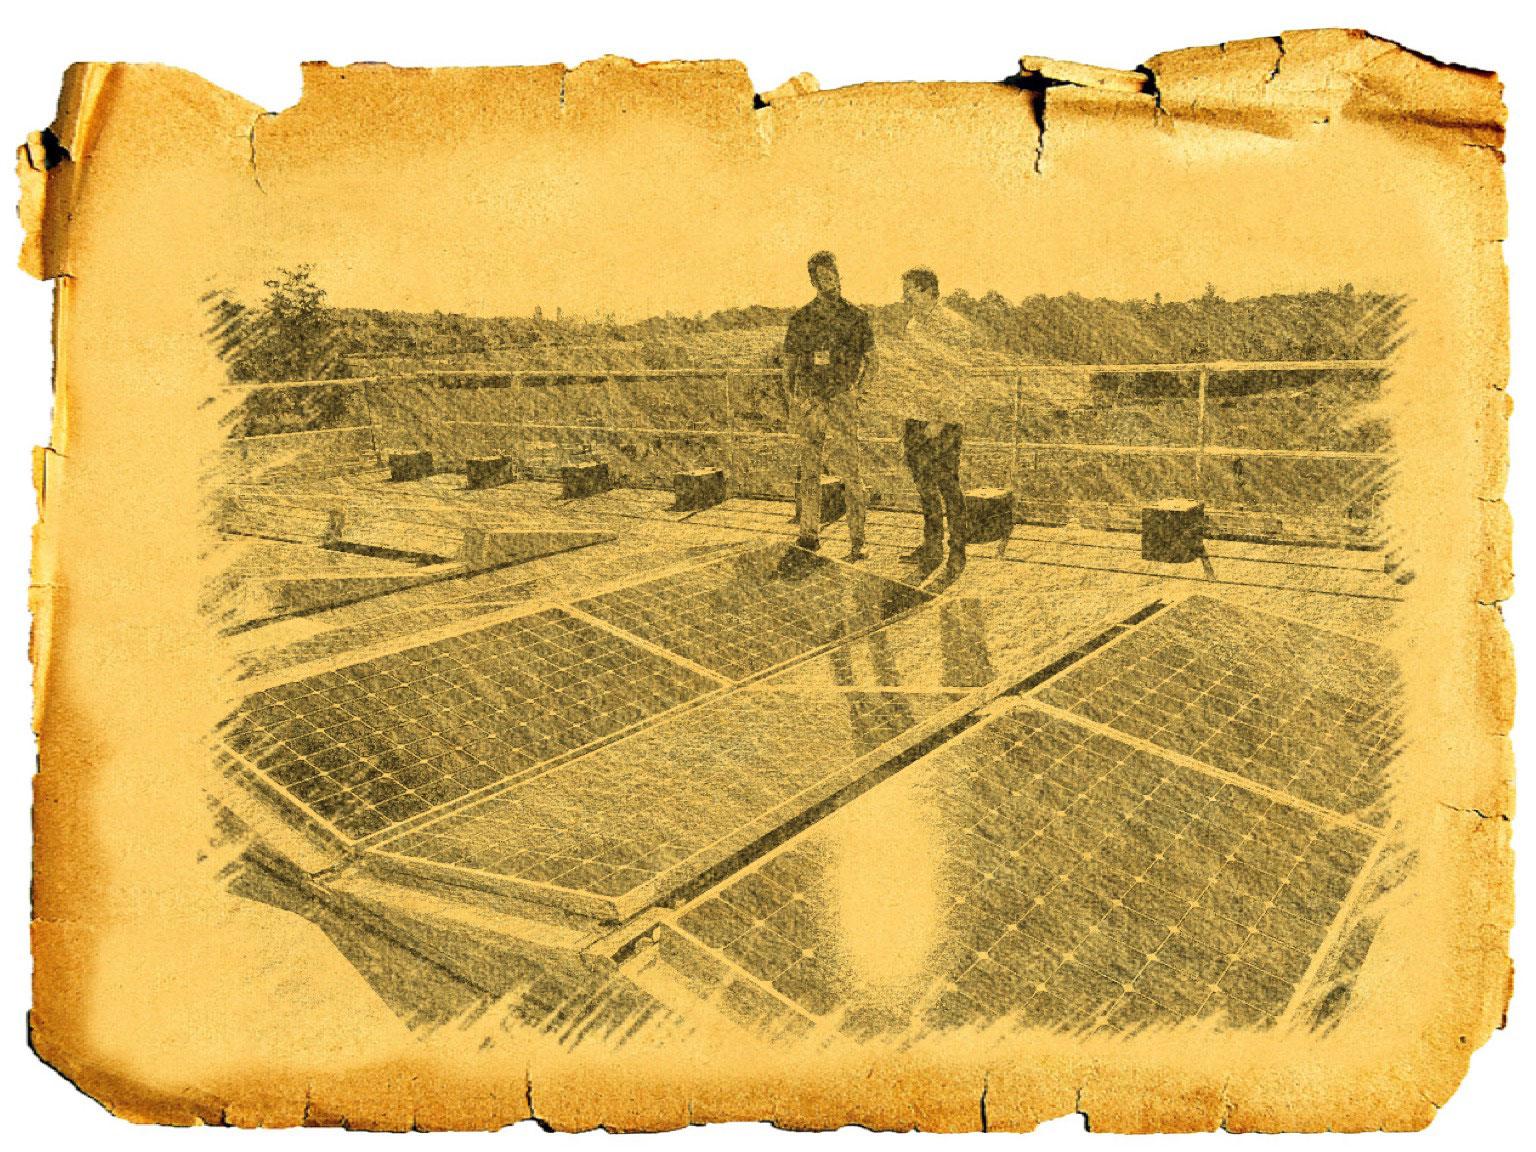 photovoltaik in deutschland solaranlagen photovoltaik. Black Bedroom Furniture Sets. Home Design Ideas